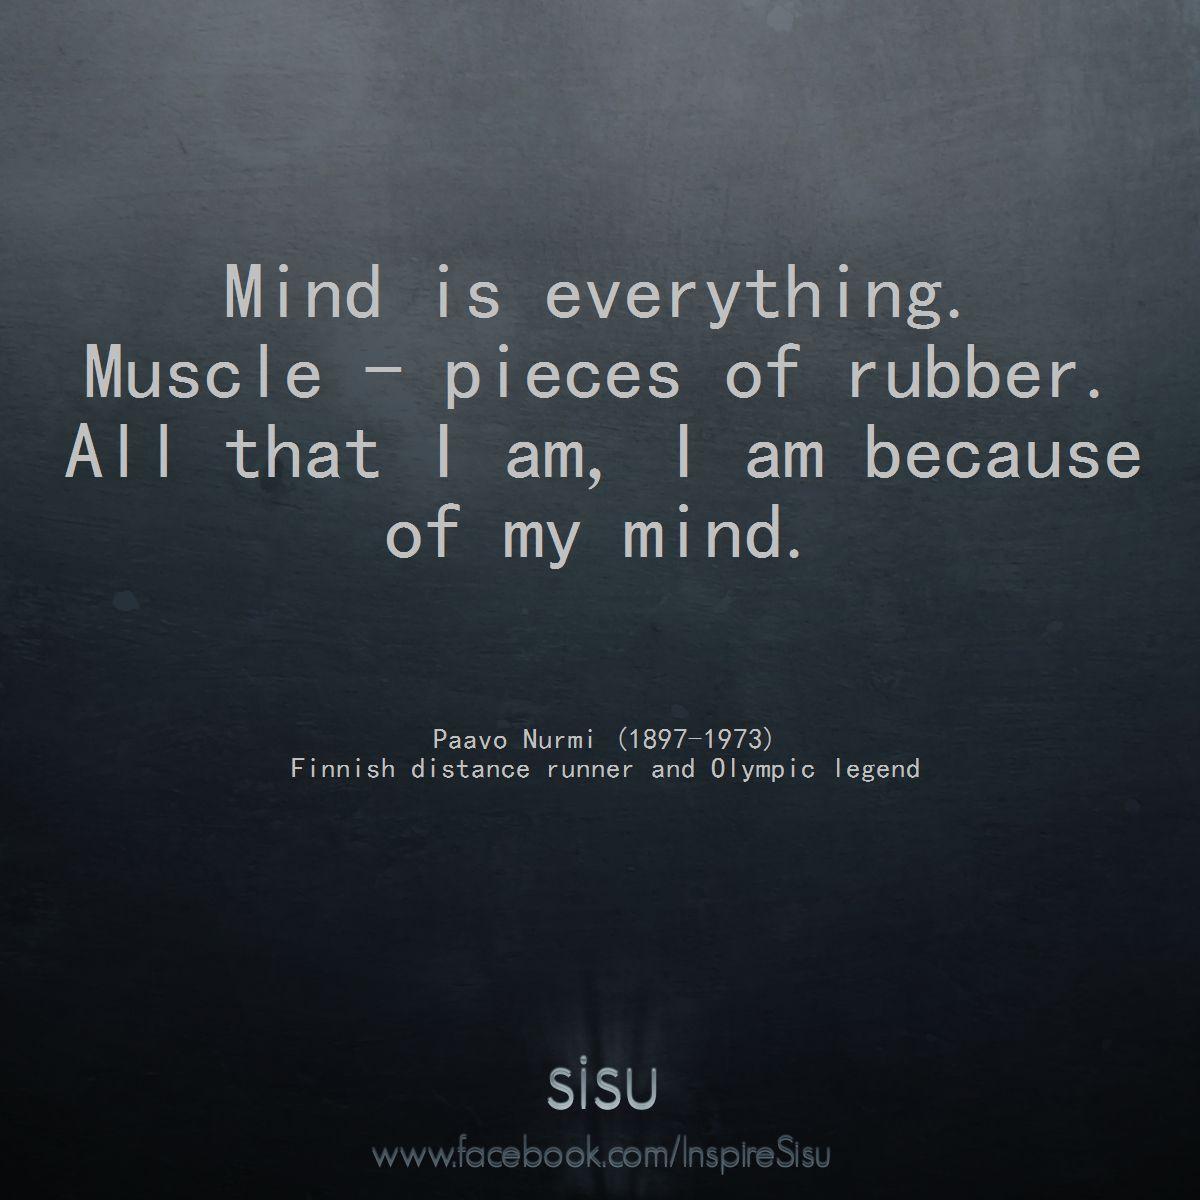 Paavo Nurmi's quote #1